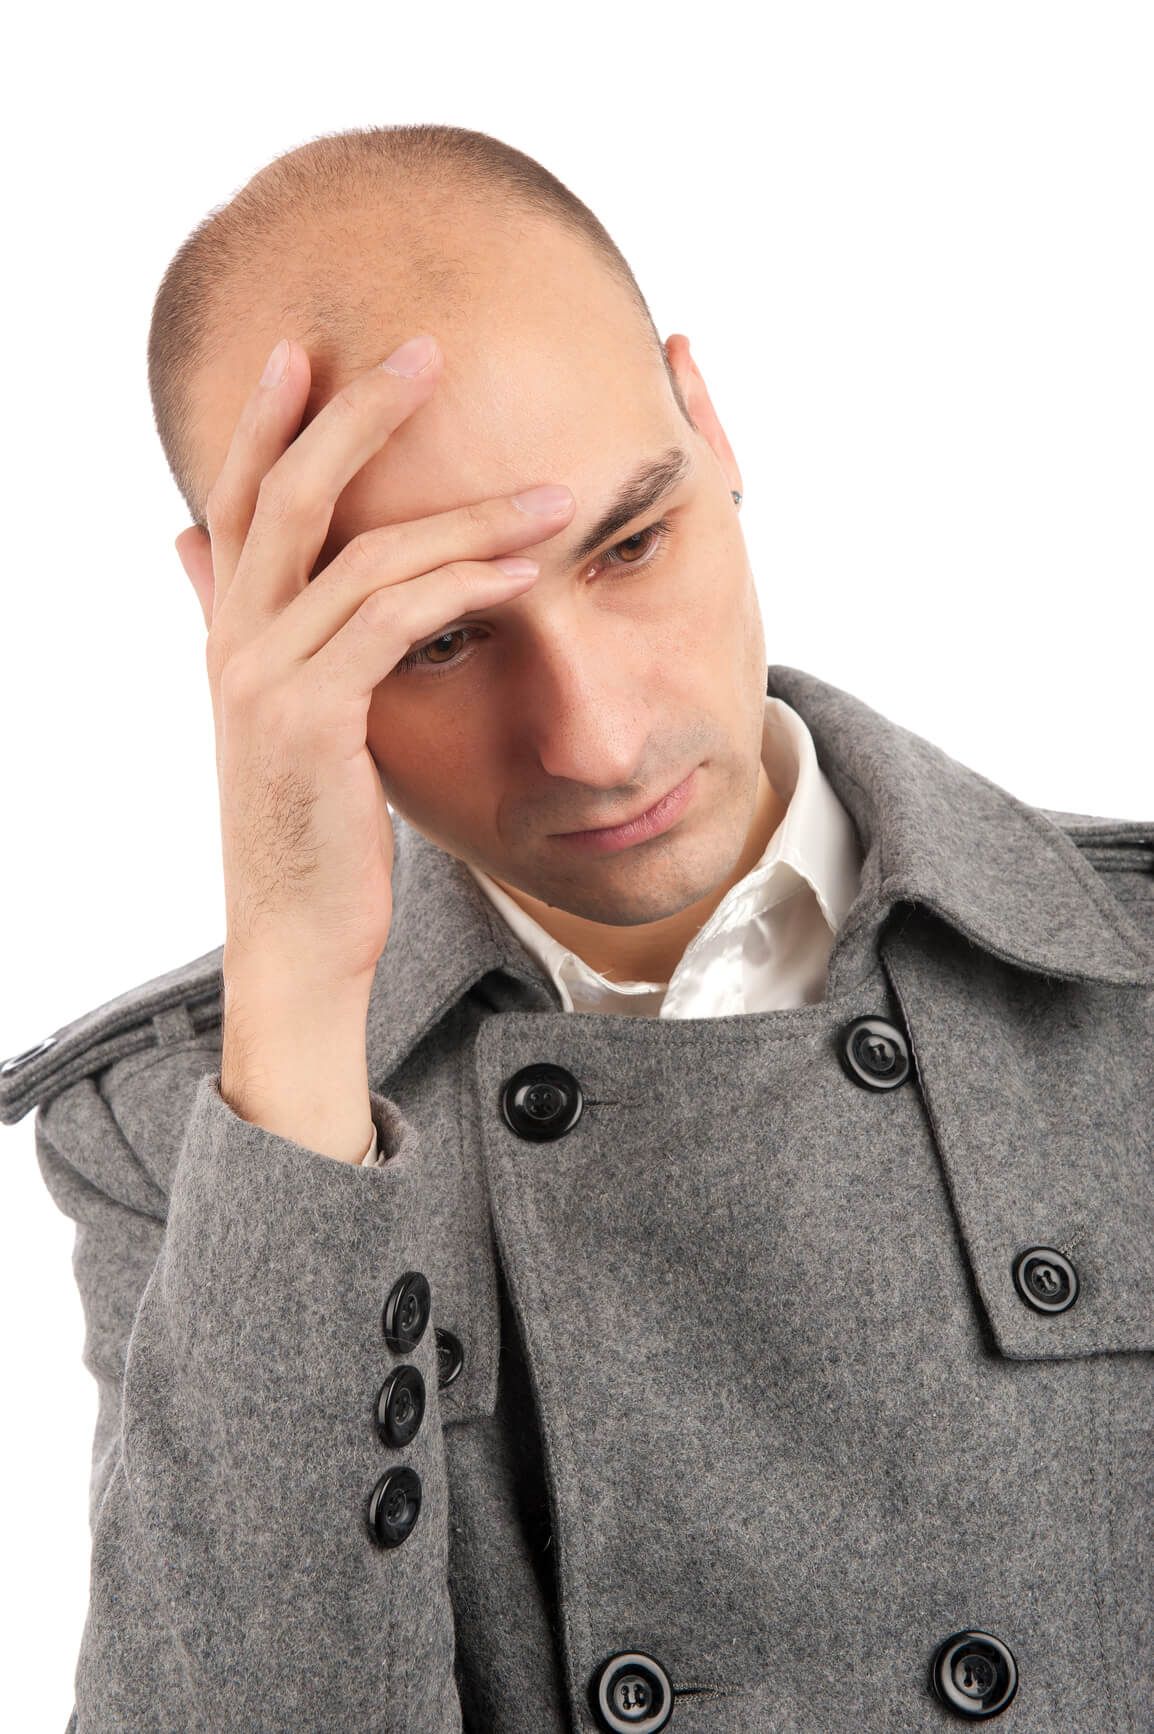 Рези при мочеиспускании у мужчин причины